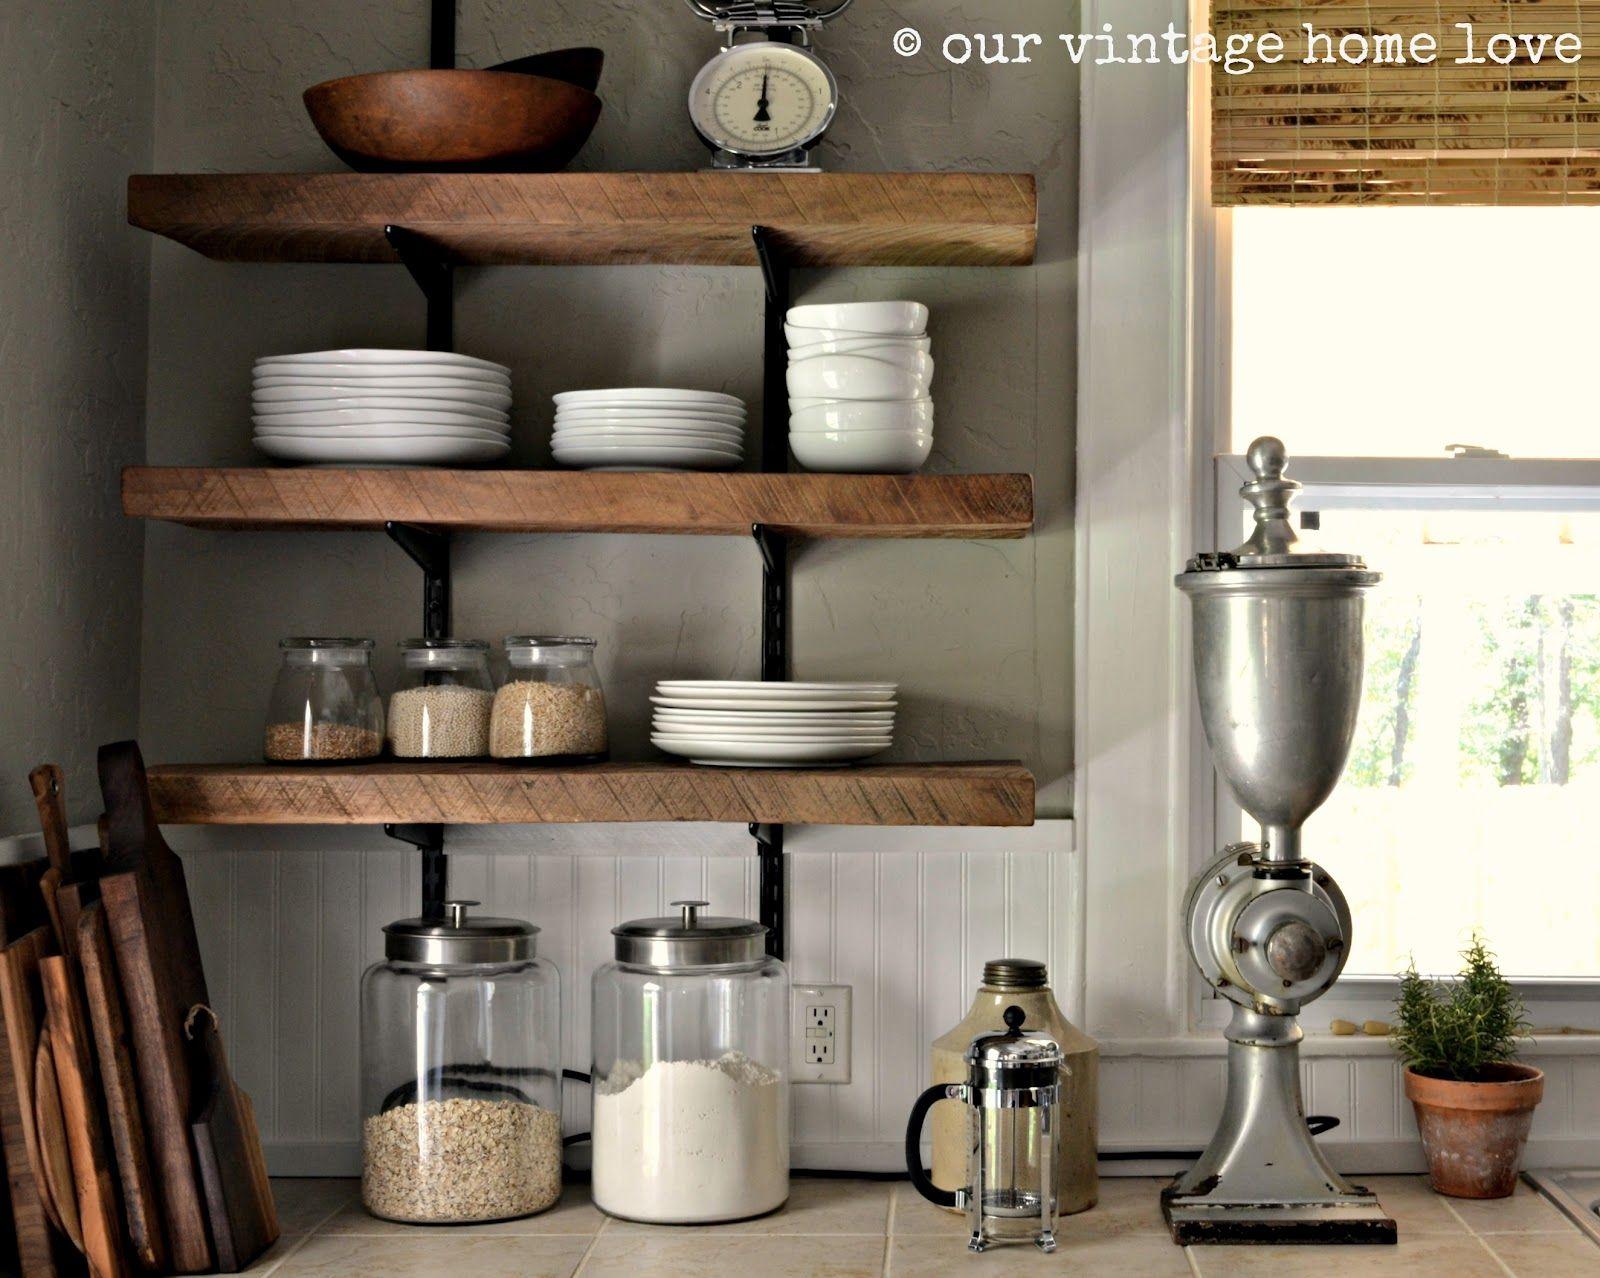 Large glass jar tabletops pics rustic shelving